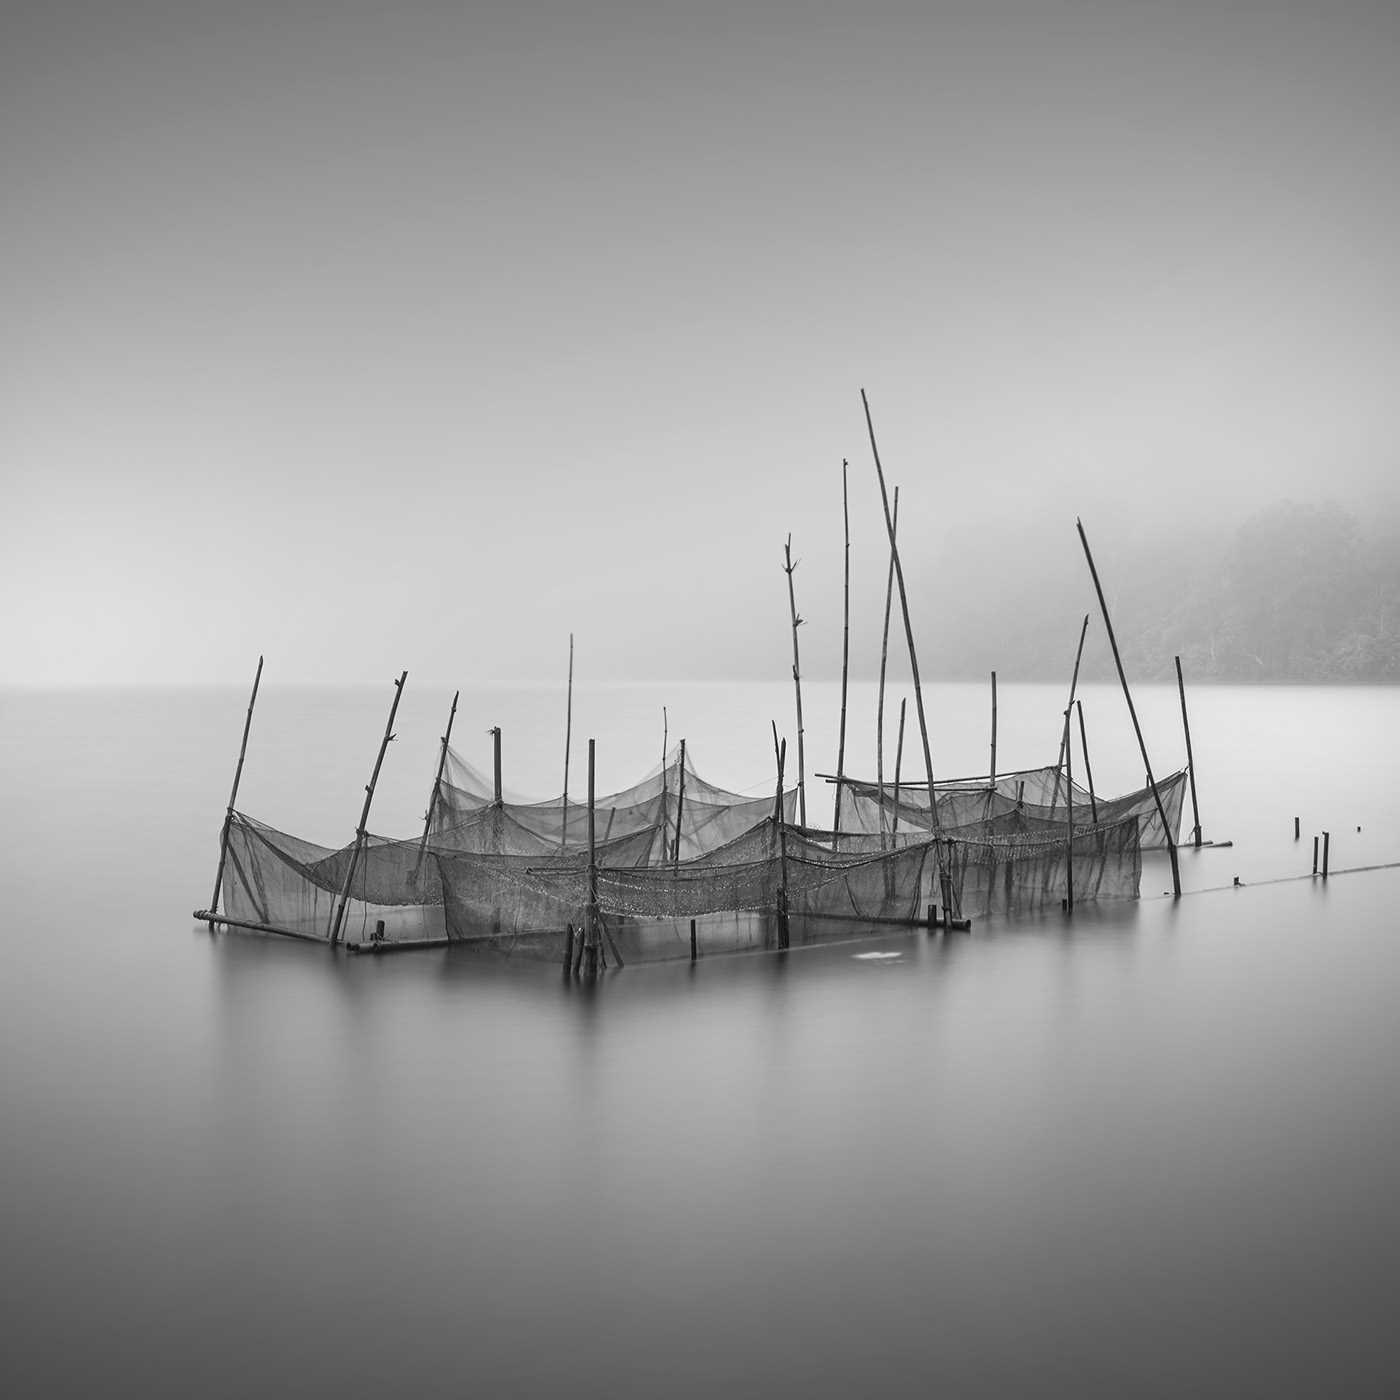 Silence: Black and White Fine Art Photography by Daniel Tjongari